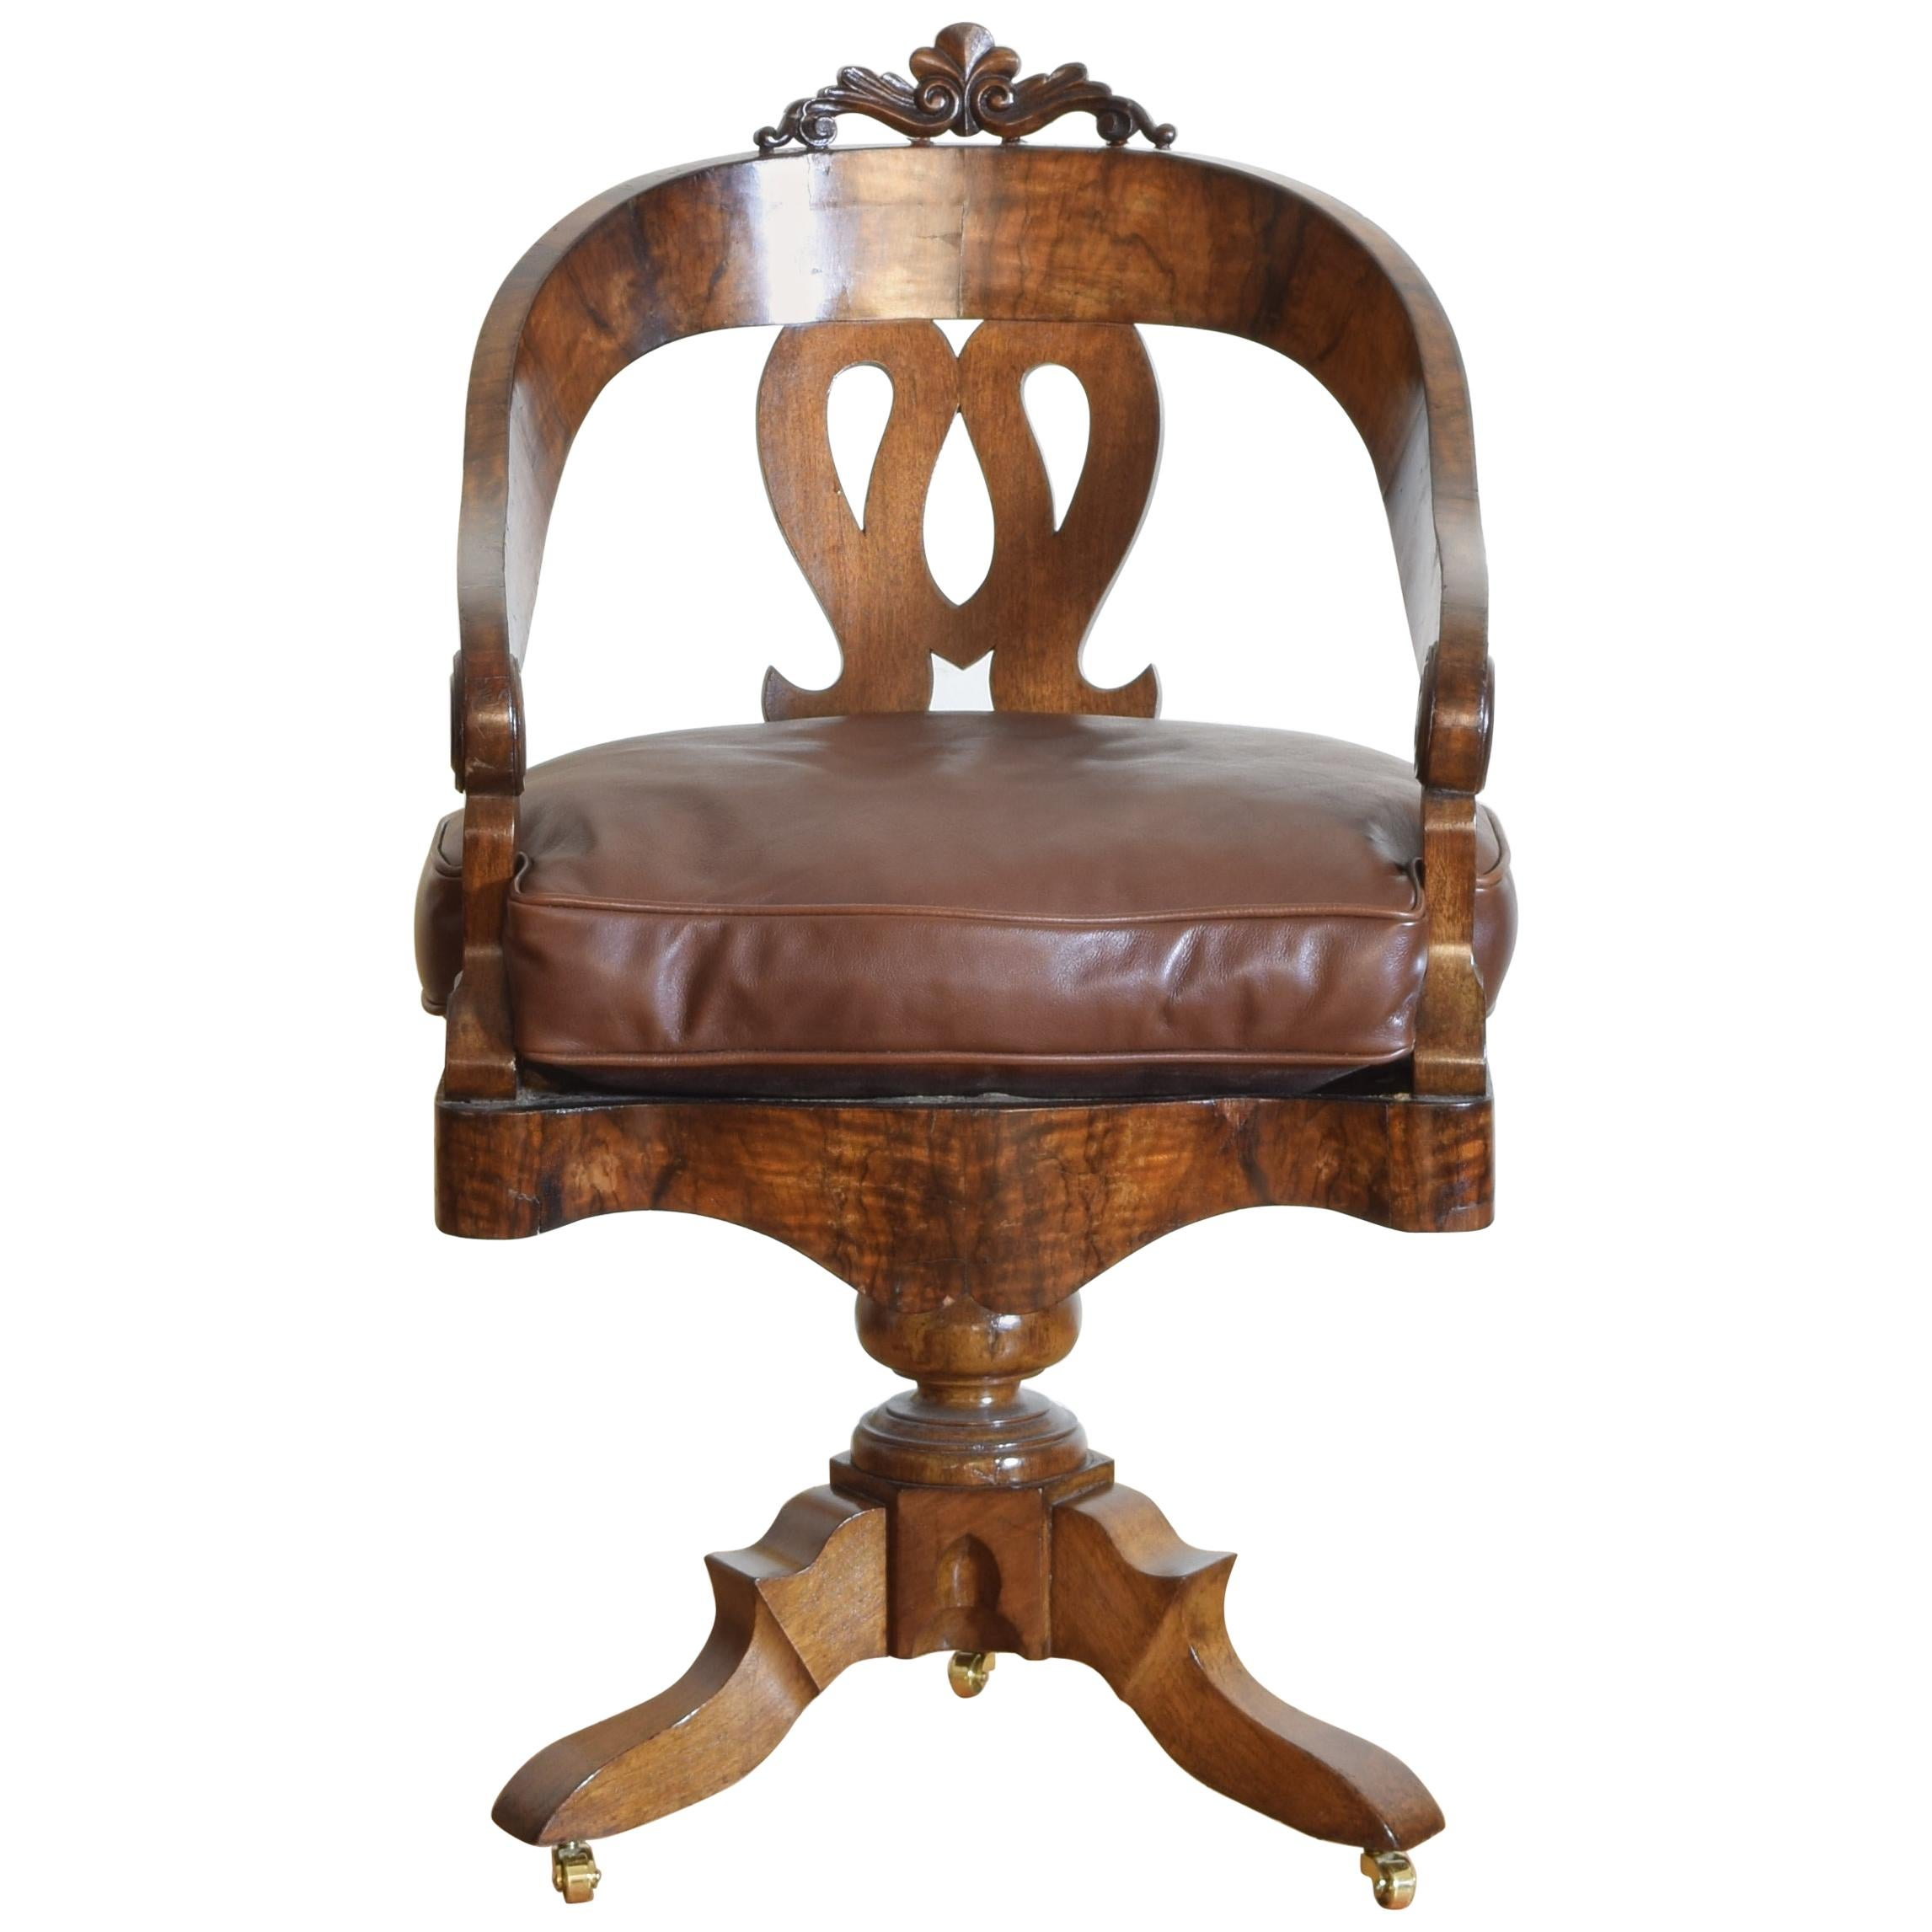 Italian, Lombardia, Walnut Swivel Desk Chair, Early 19th Century